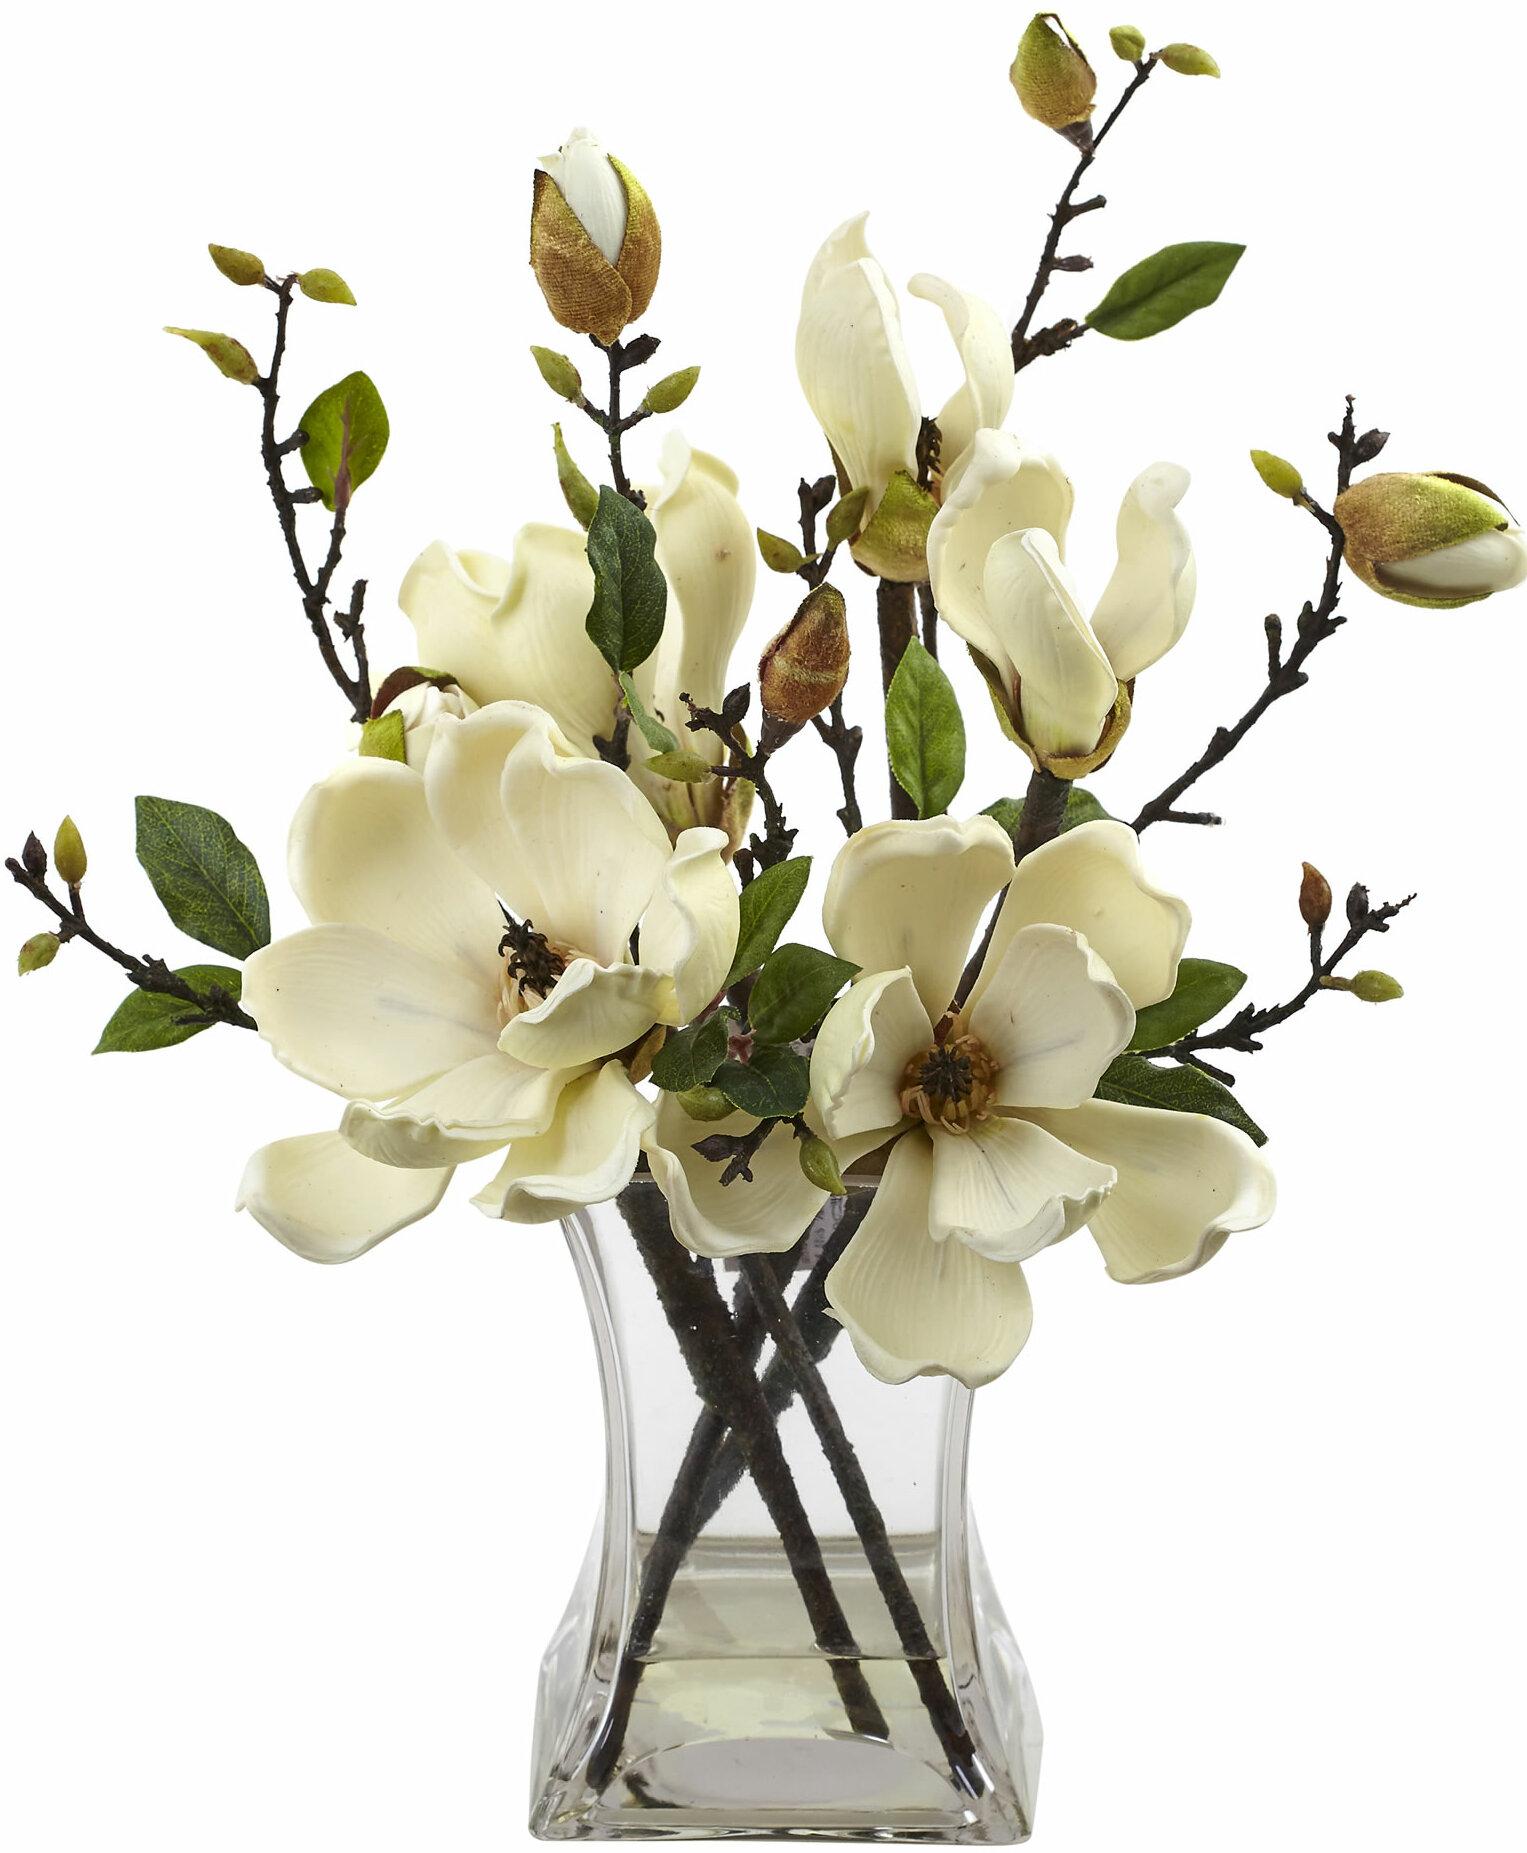 Laurel Foundry Modern Farmhouse Magnolia Arrangement With Vase